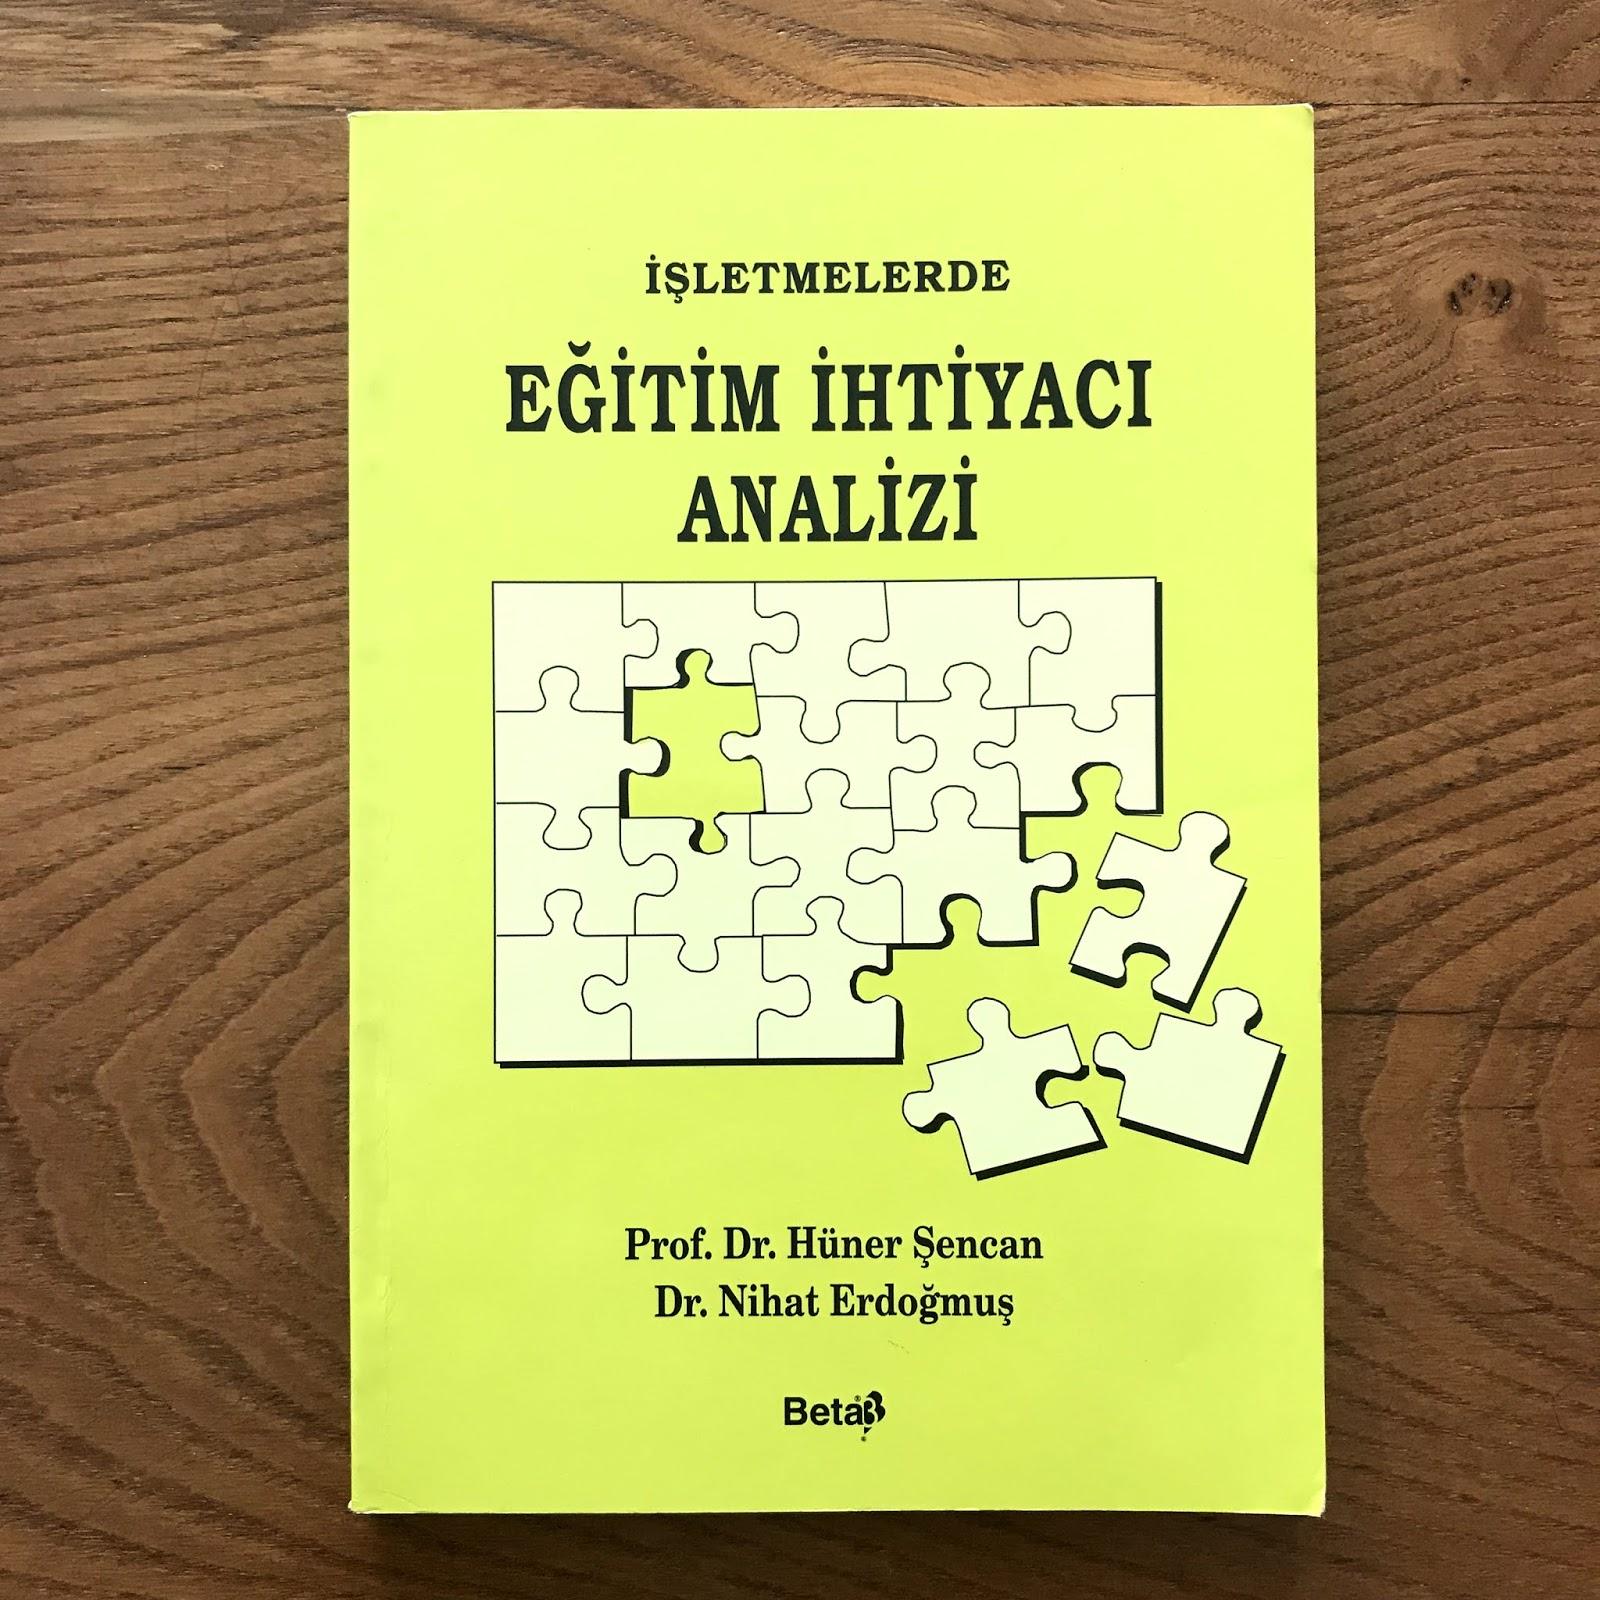 Isletmelerde Egitim Ihtiyaci Analizi